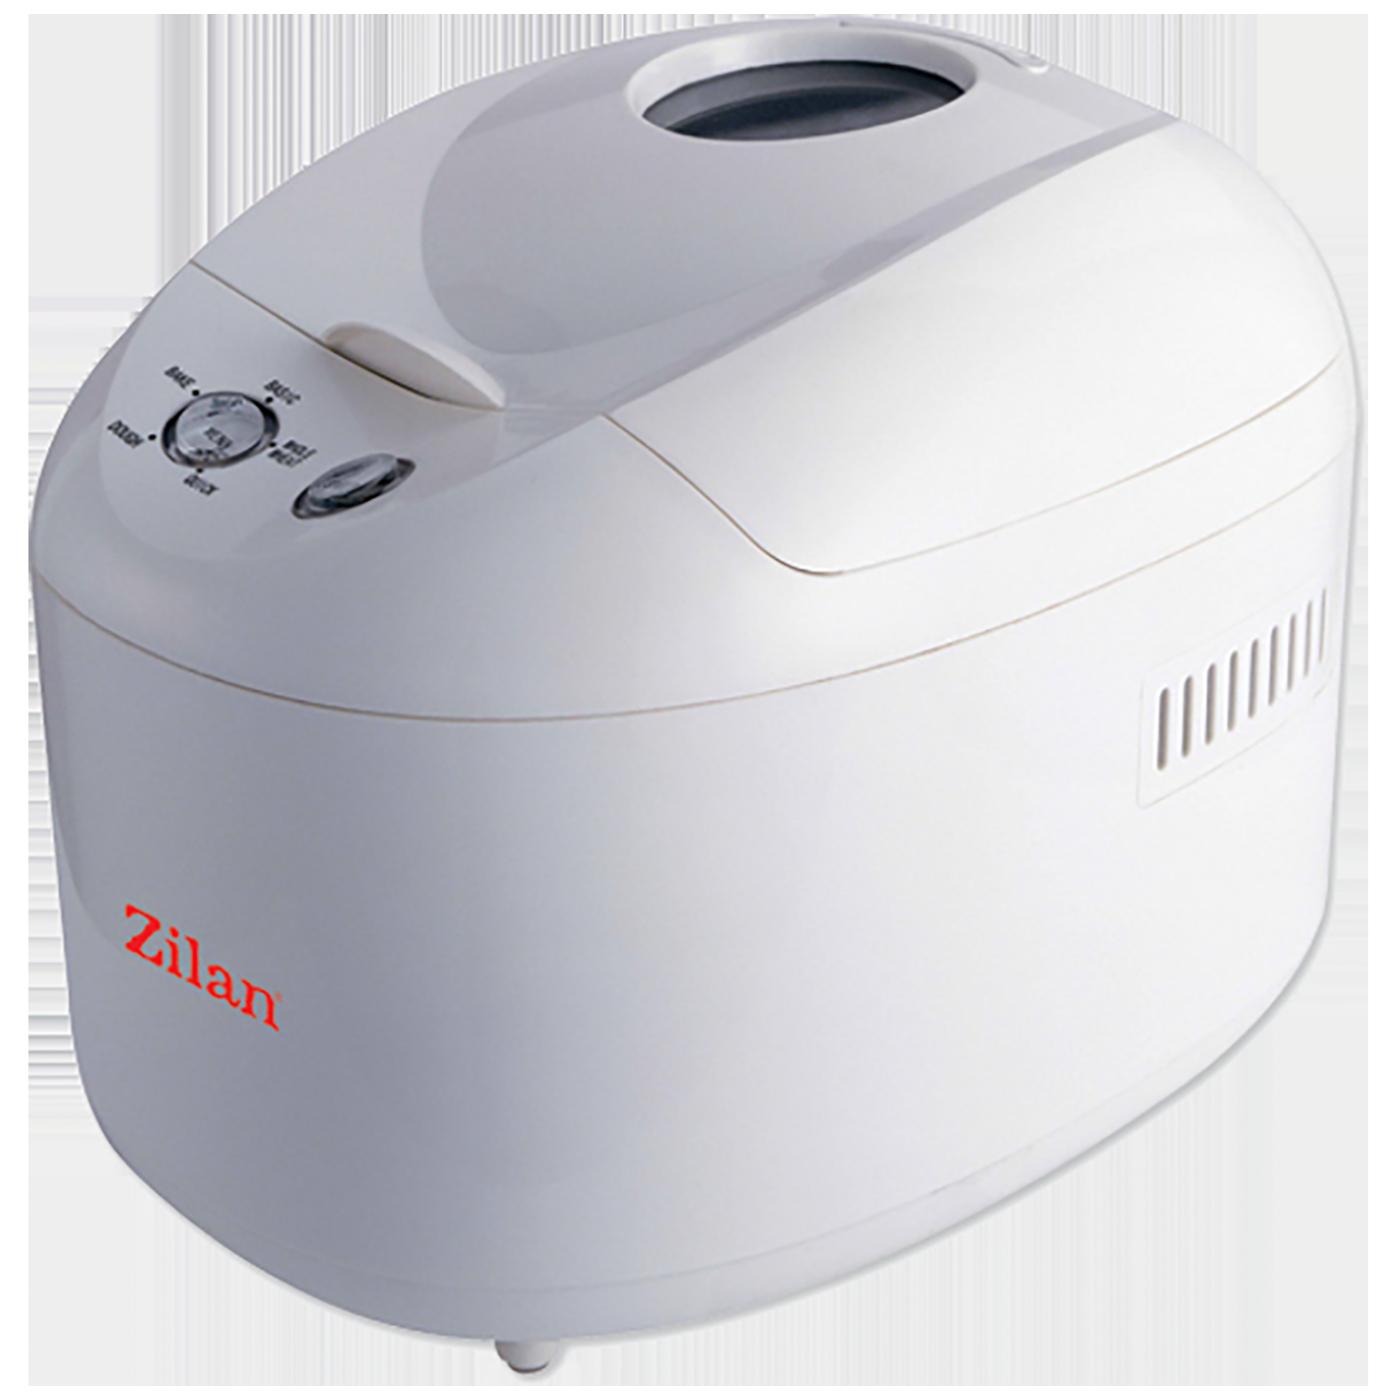 Zilan - ZLN7948